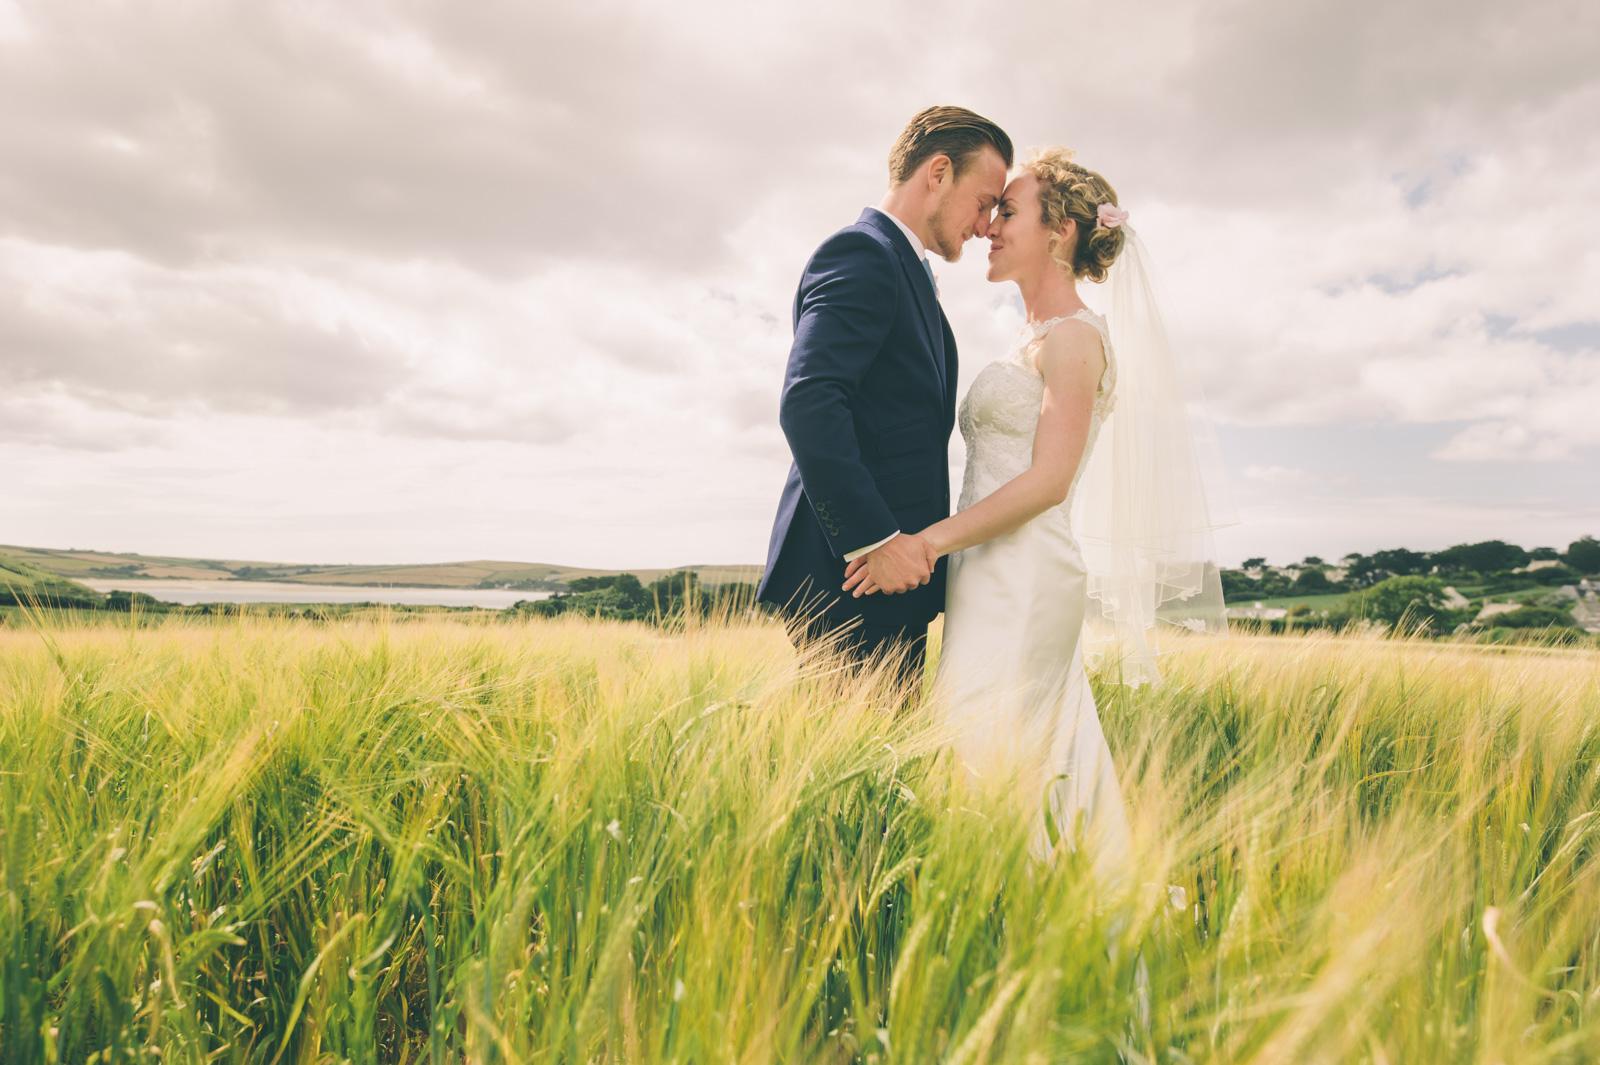 wedding-photography-rock-99.jpg